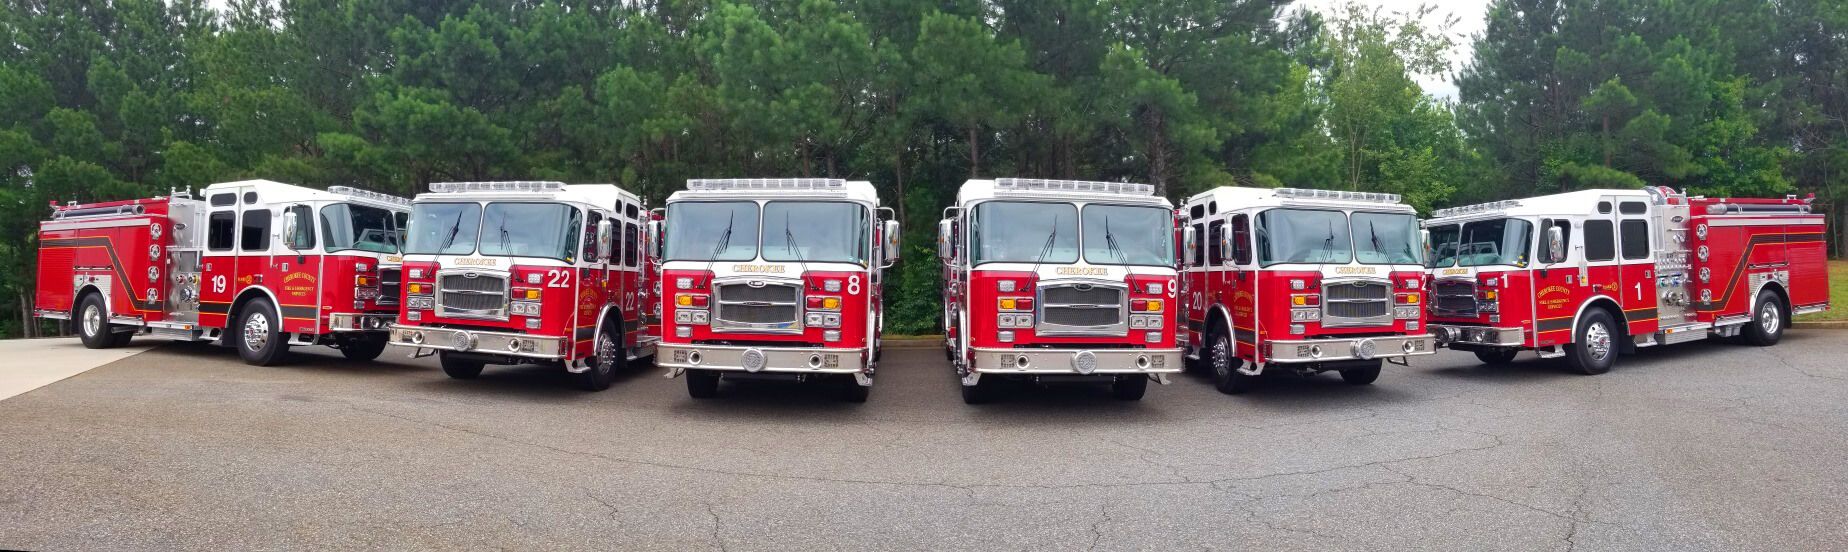 E-ONE-Pumpers-CherokeeCounty6